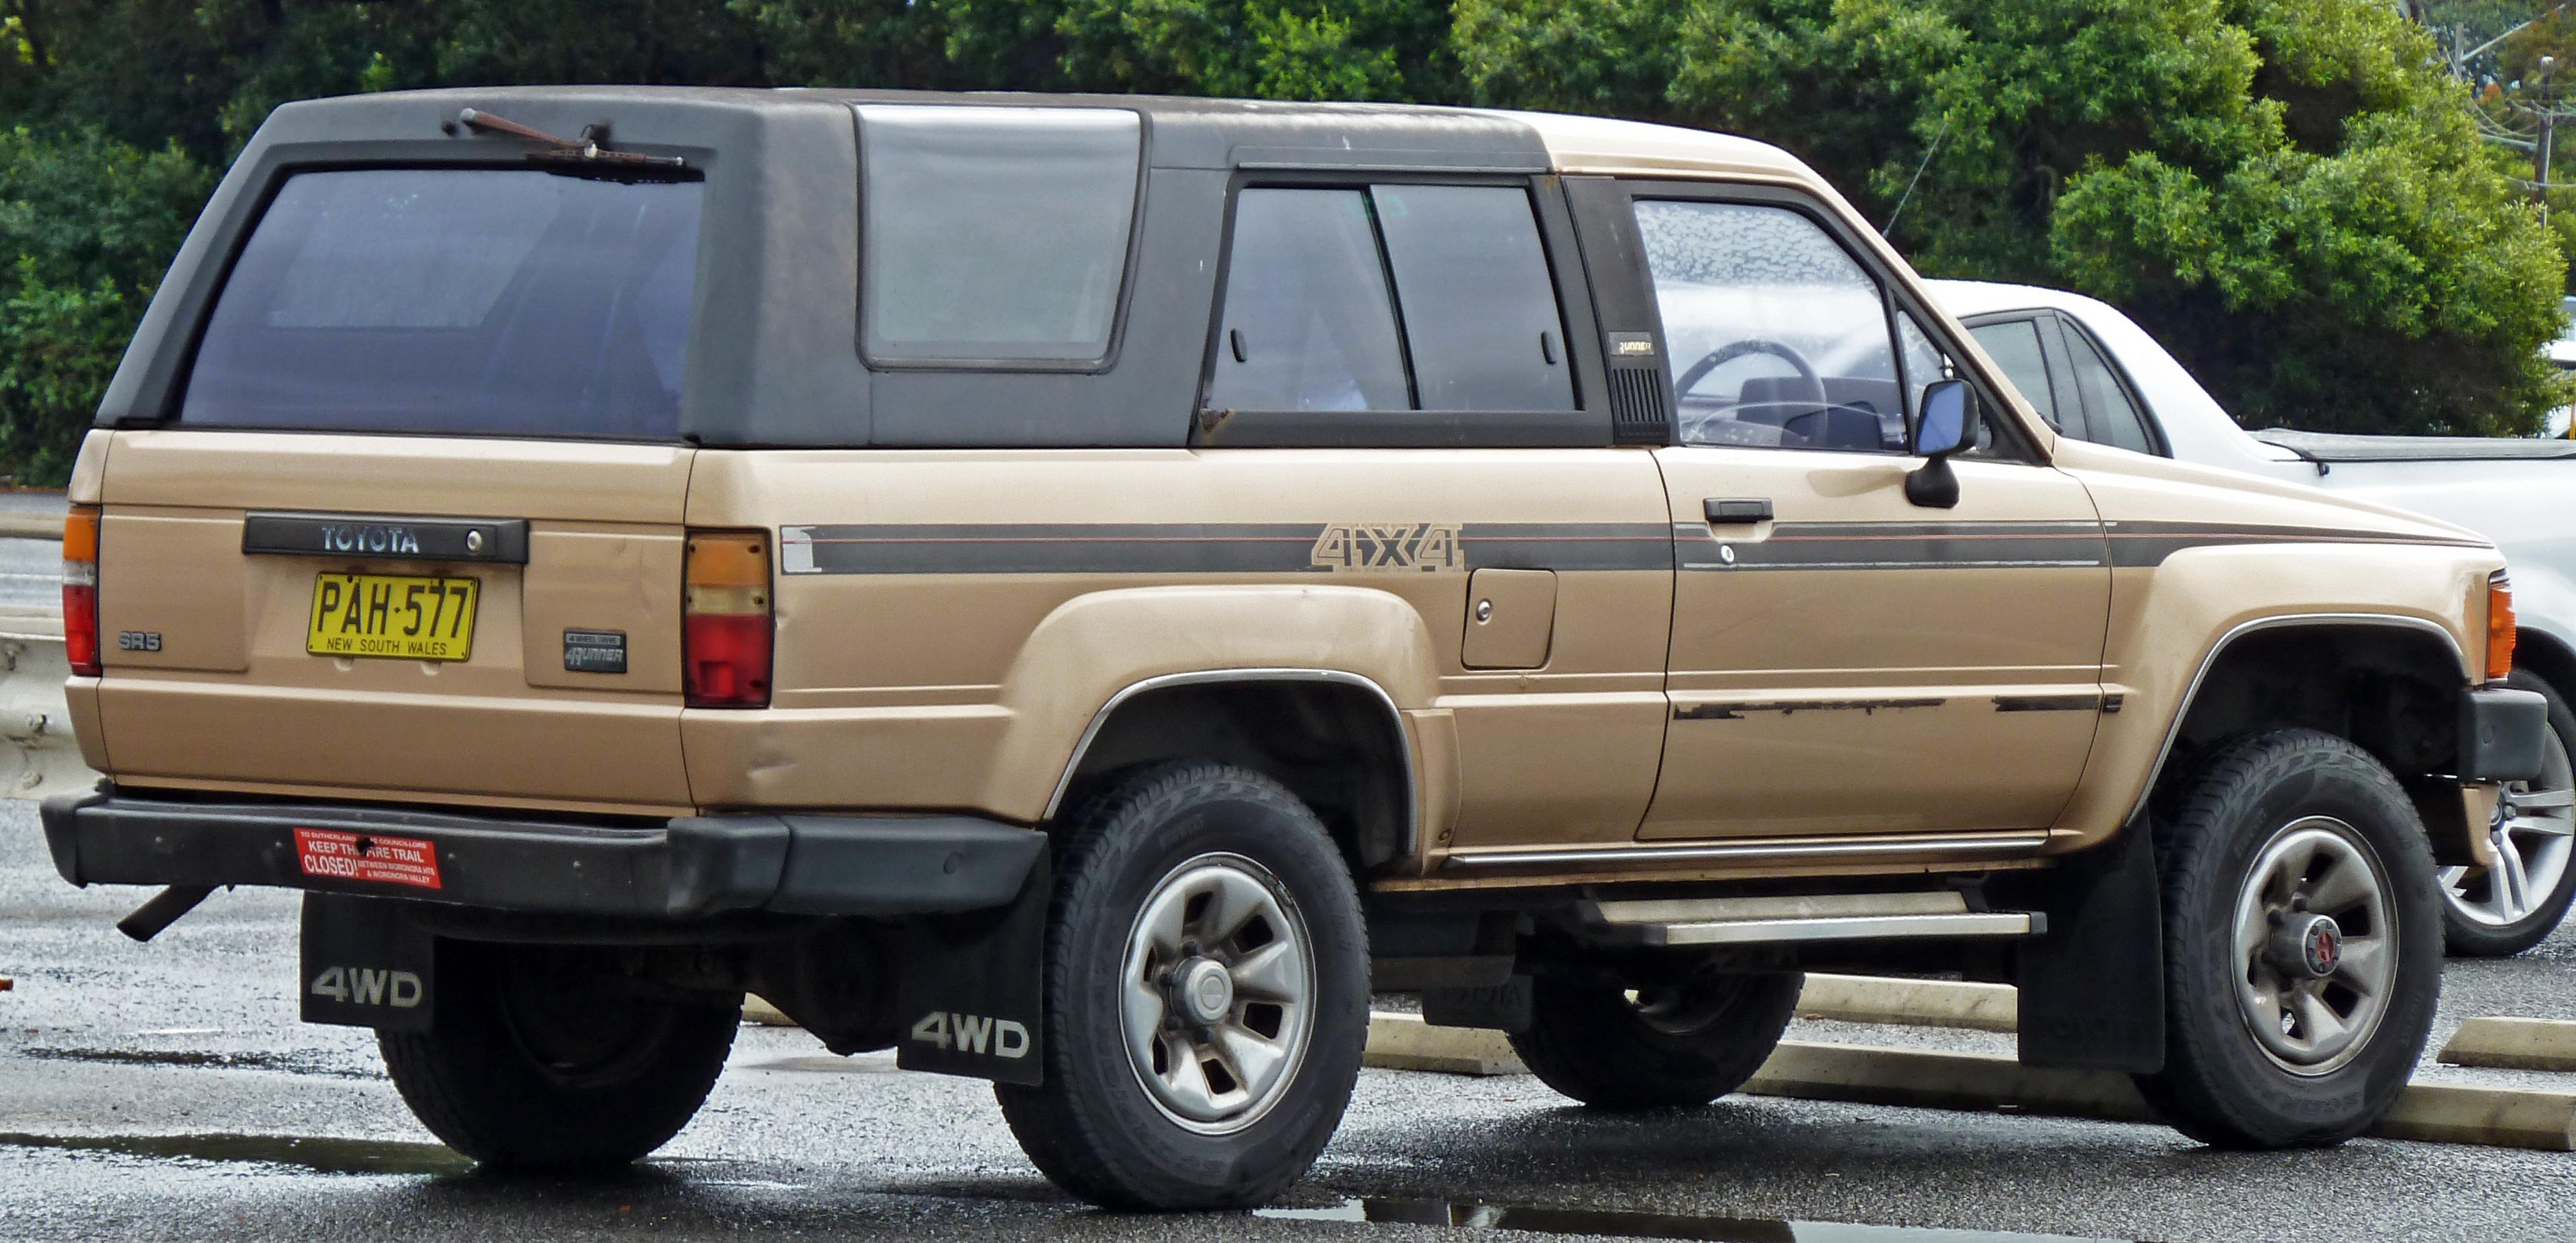 file 1987 1989 toyota hilux 4runner sr5 wagon 03 jpg wikimedia commons rh commons wikimedia org 1989 toyota 4runner repair manual pdf 1989 toyota 4runner service manual pdf